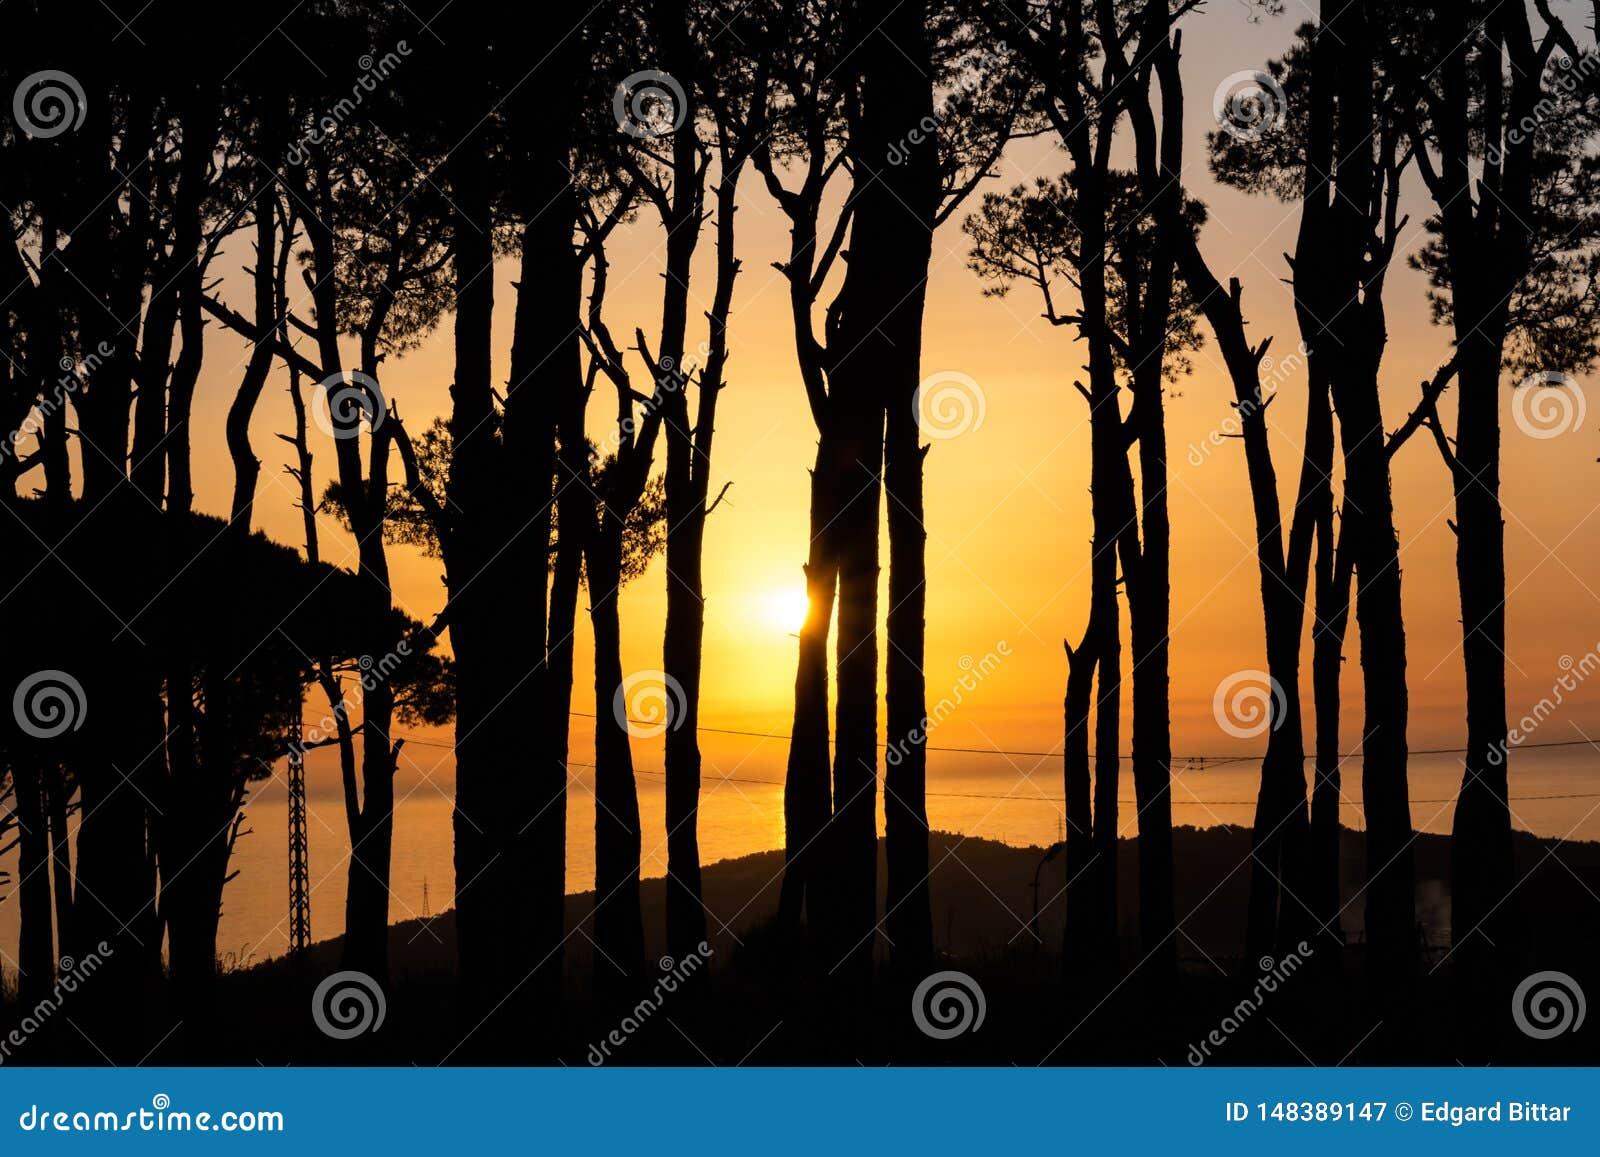 Sunset during walking in Nature